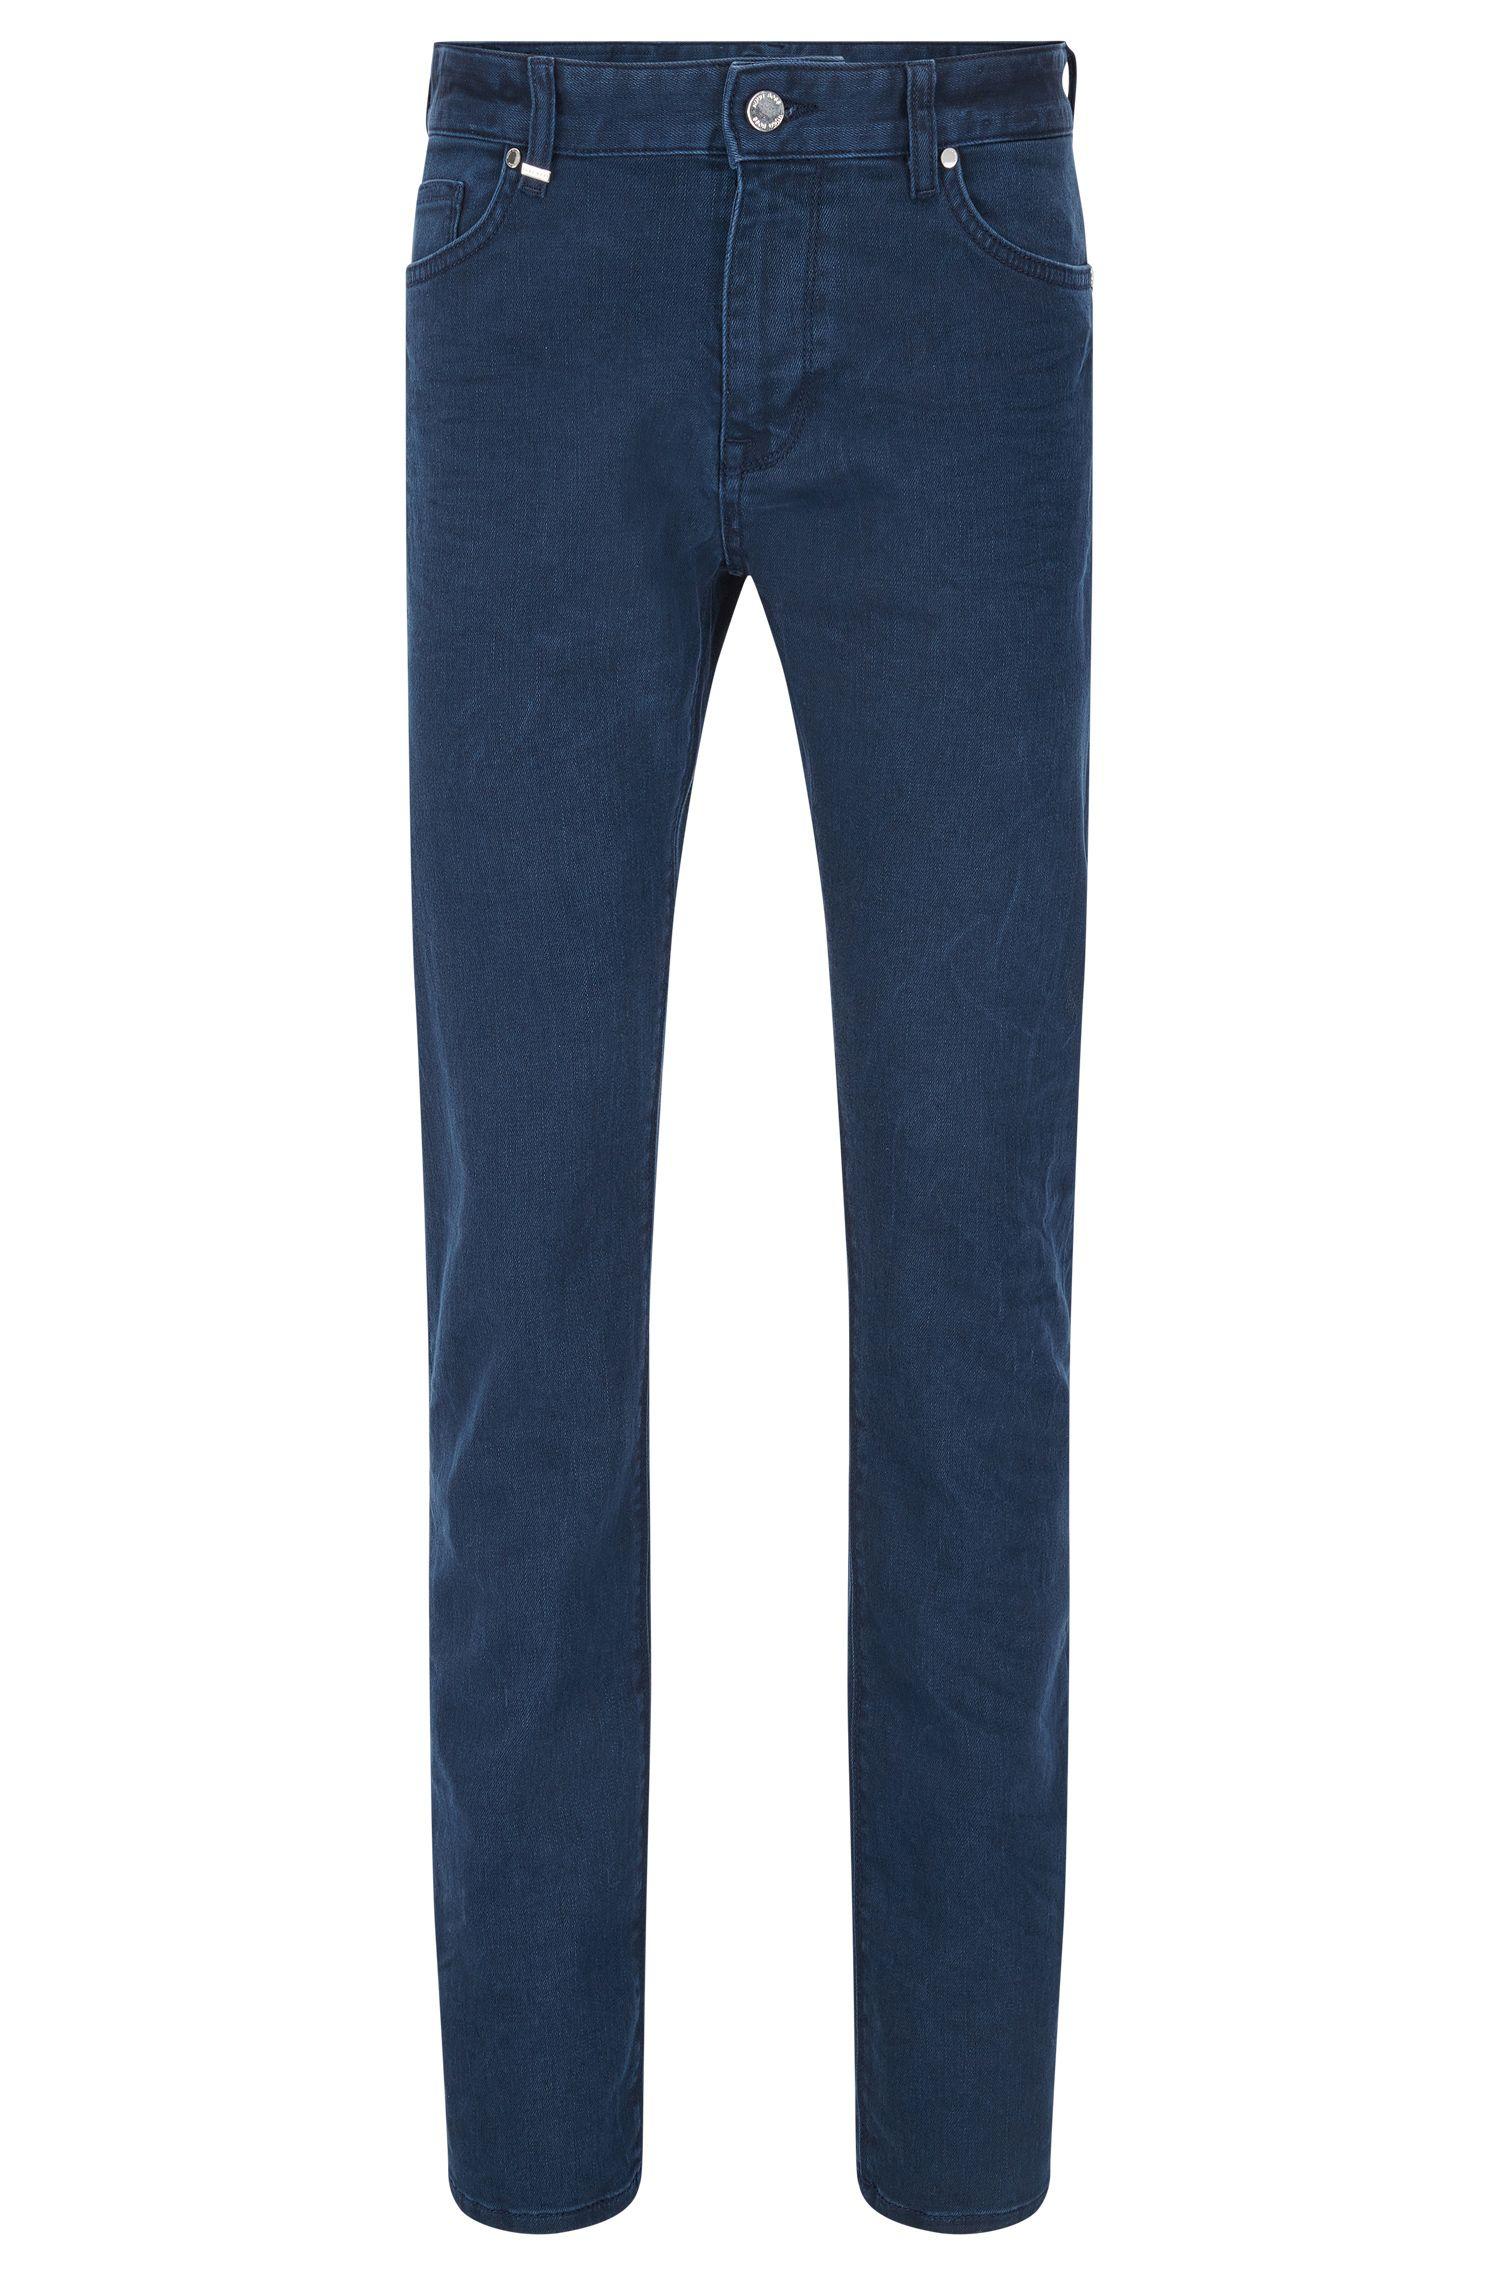 'Maine' | Regular Fit, 11.25 oz Stretch Cotton Jeans